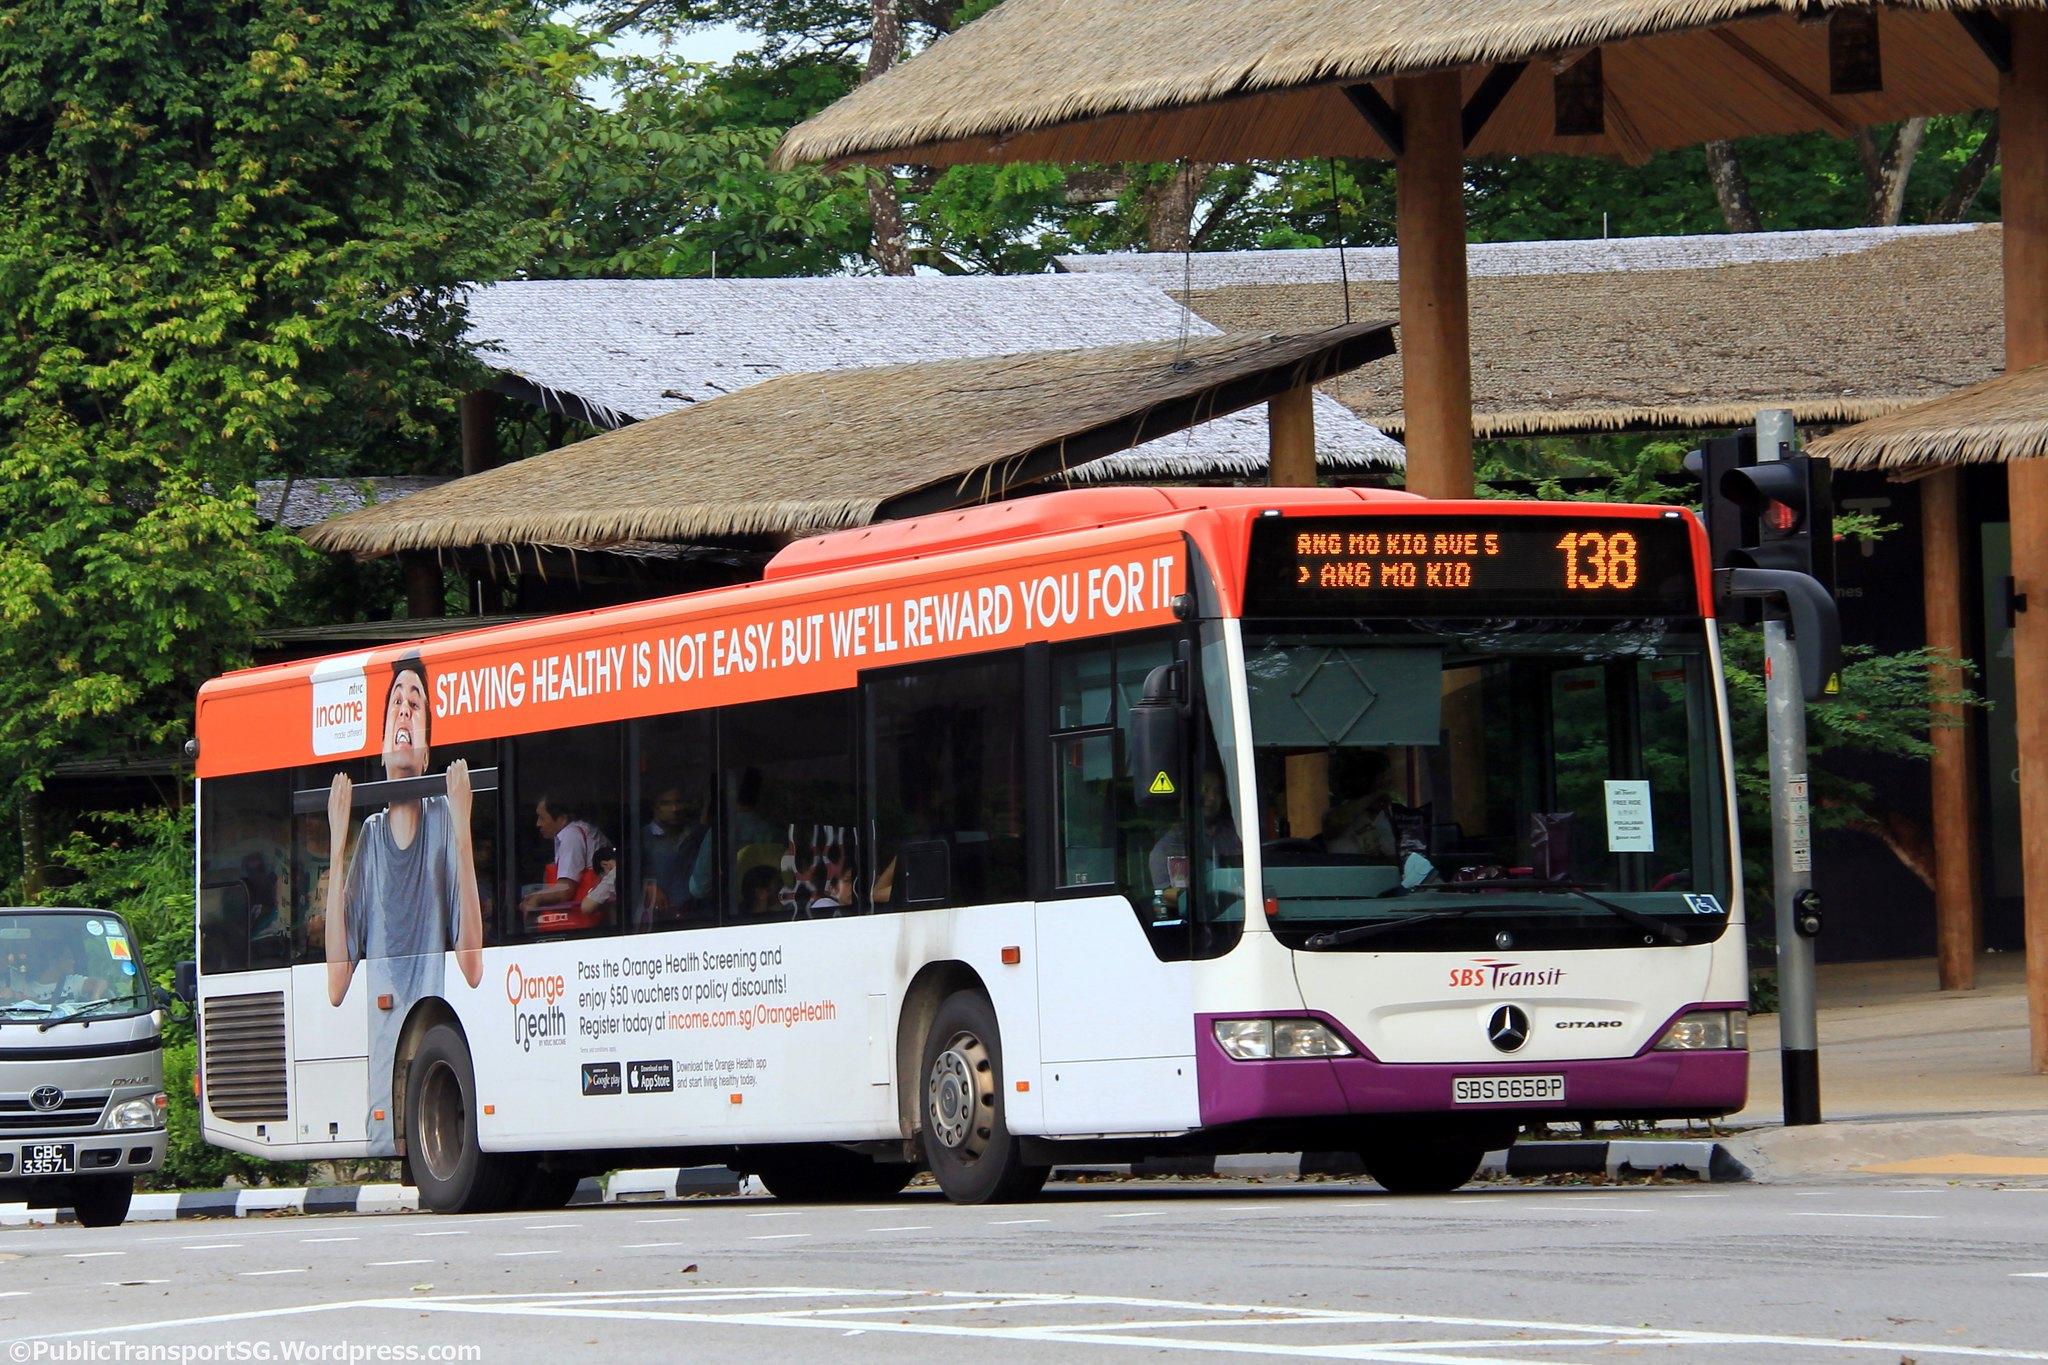 「singapore bus 138」の画像検索結果